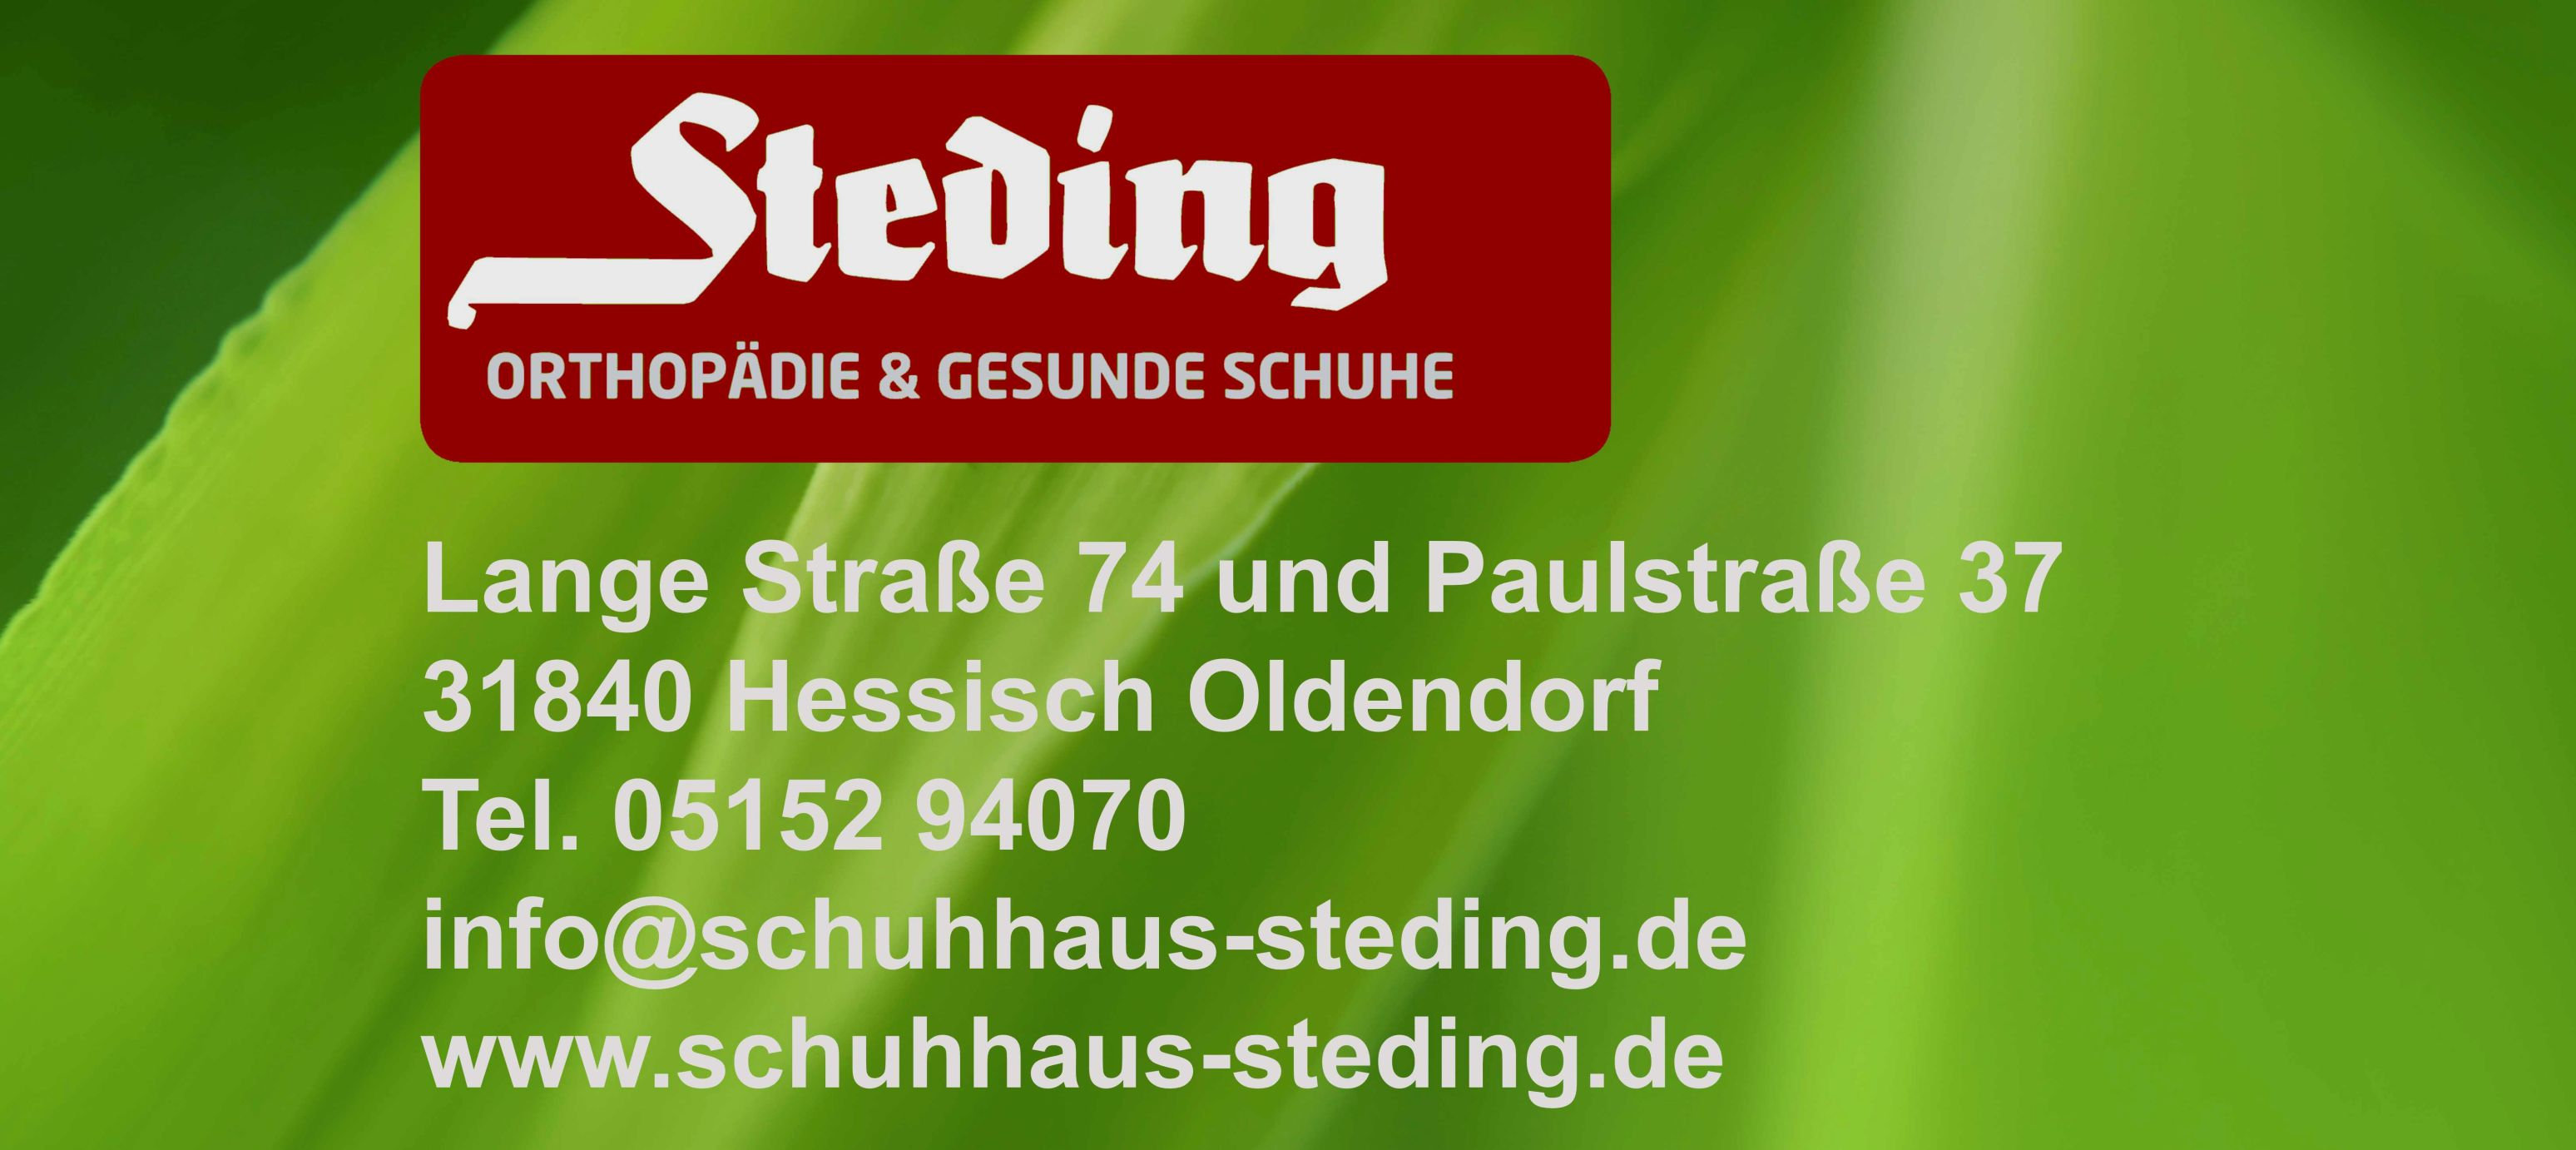 Schuhhaus Steding